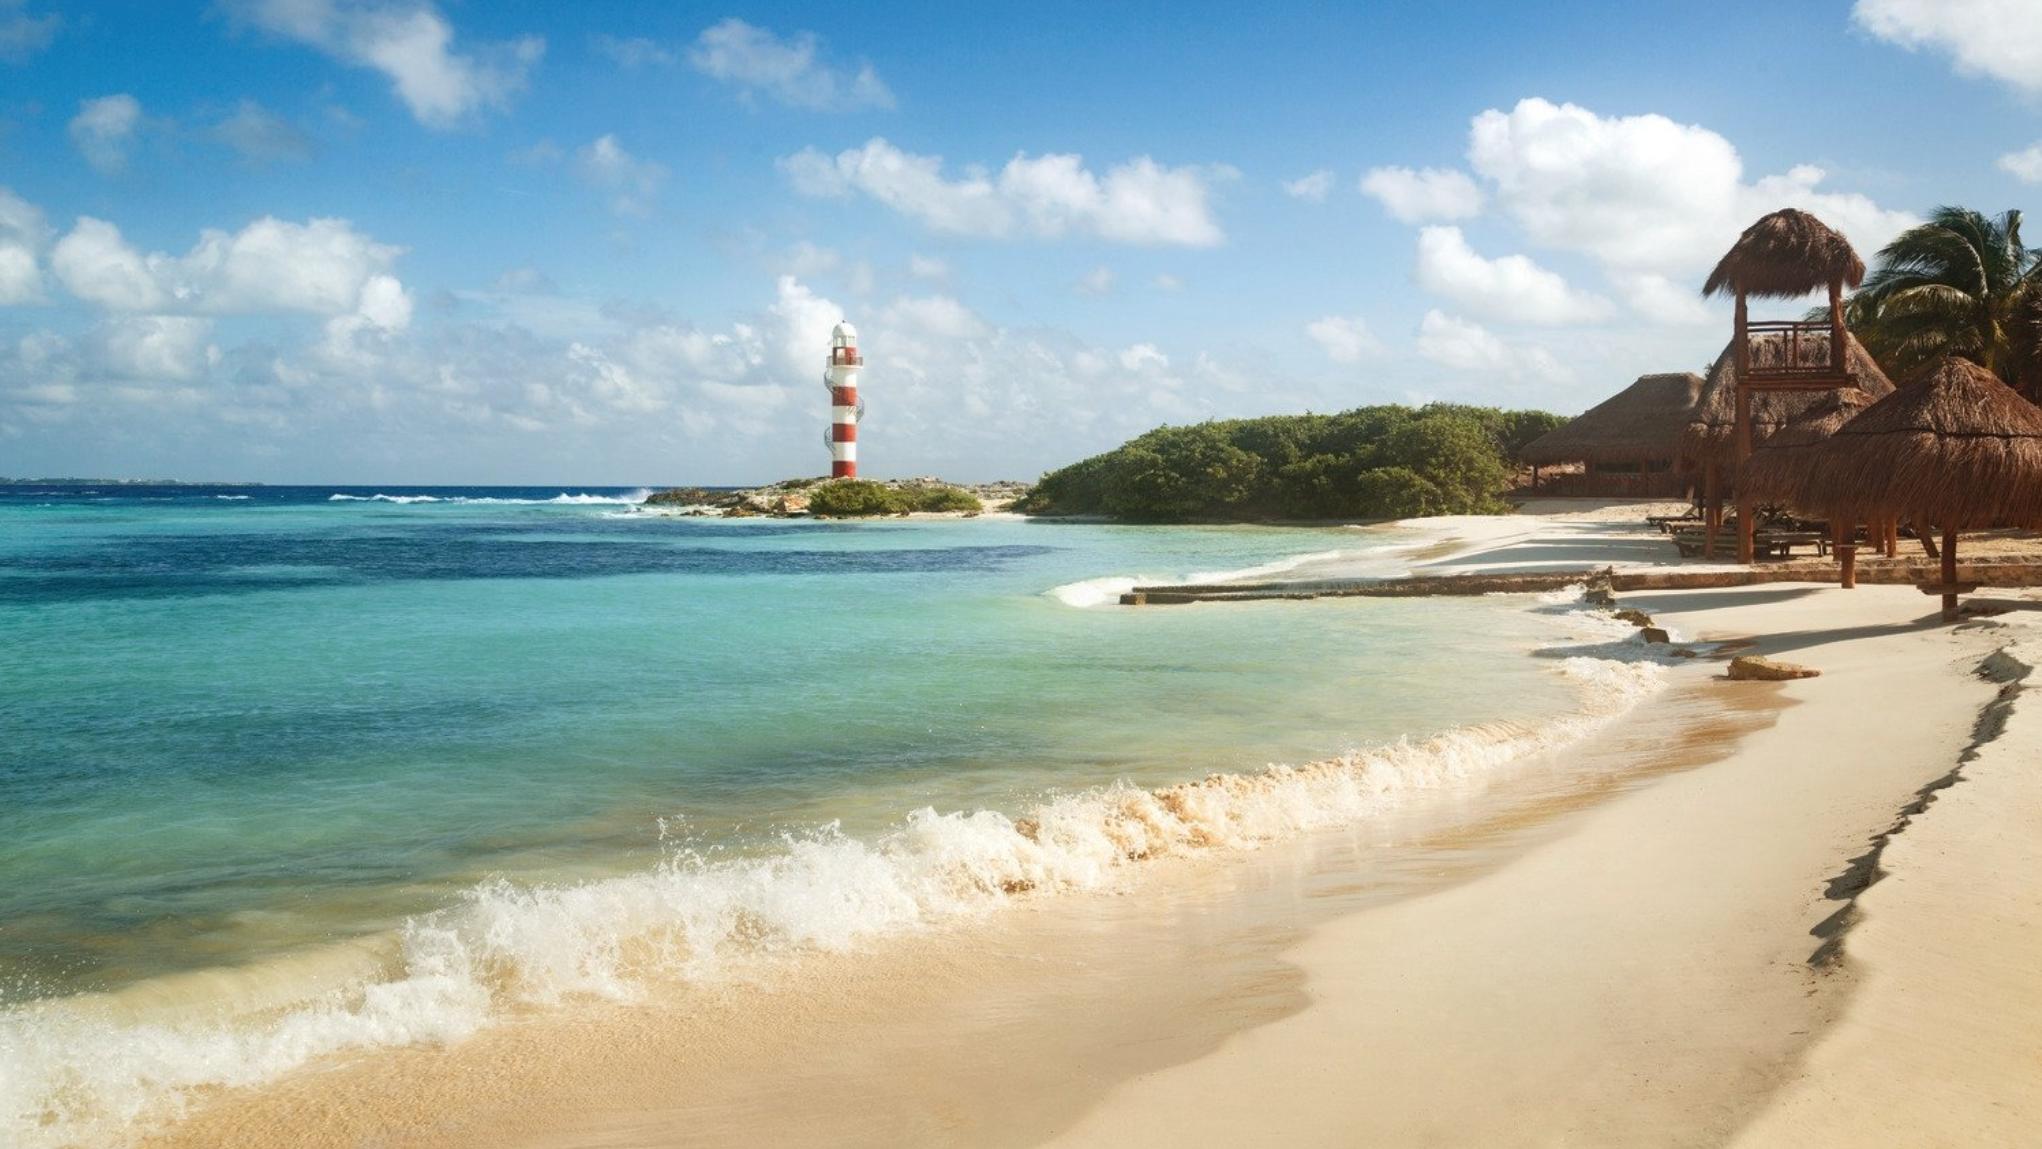 Indian Destination Wedding Hyatt Ziva Cancun 1.PNG